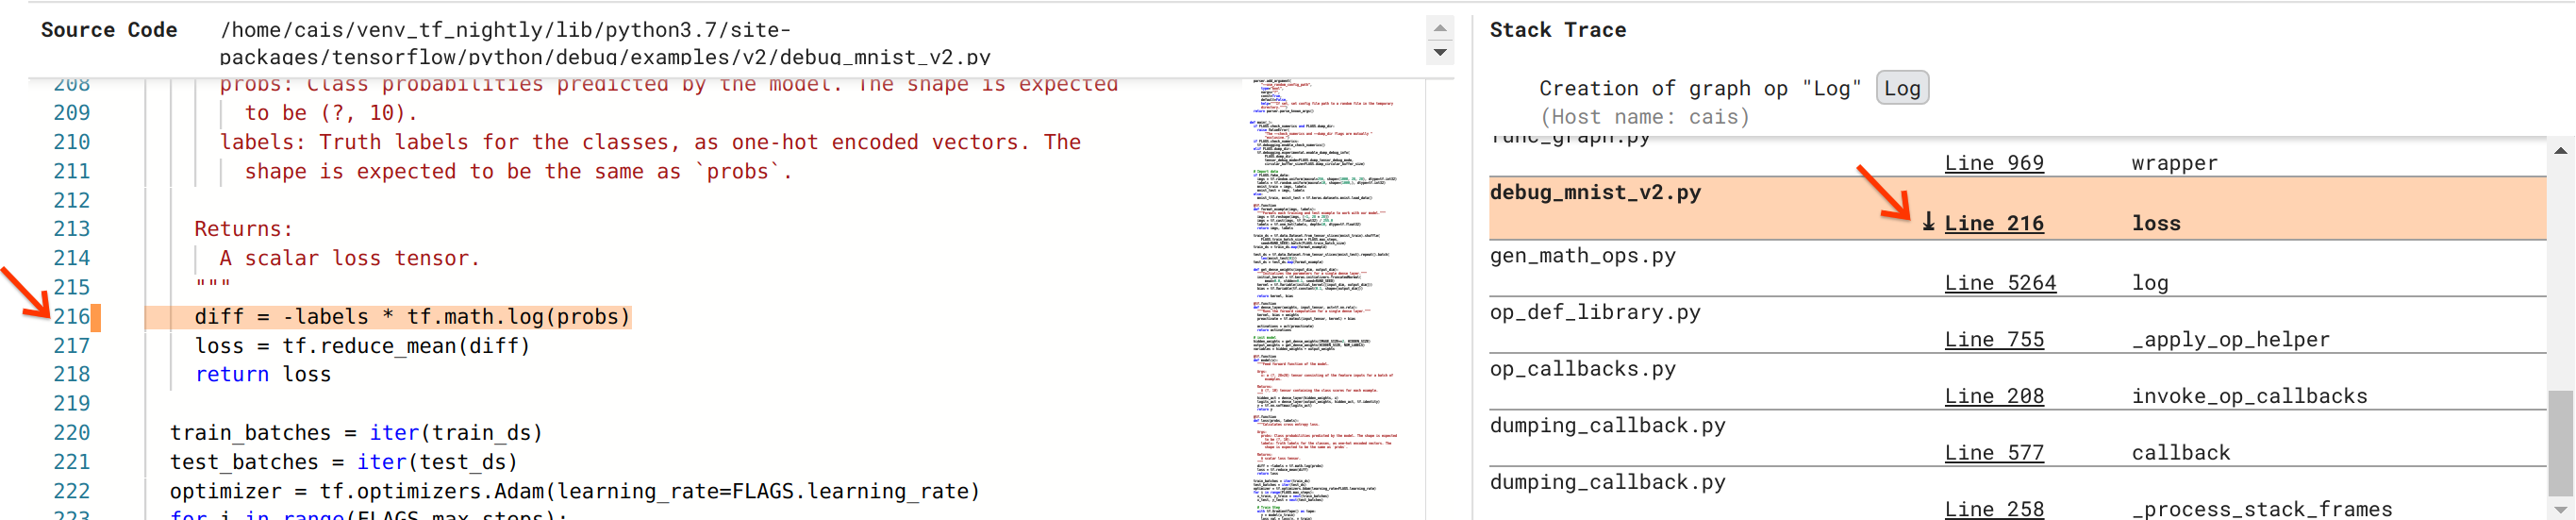 Debugger V2: Quellcode und Stack-Trace